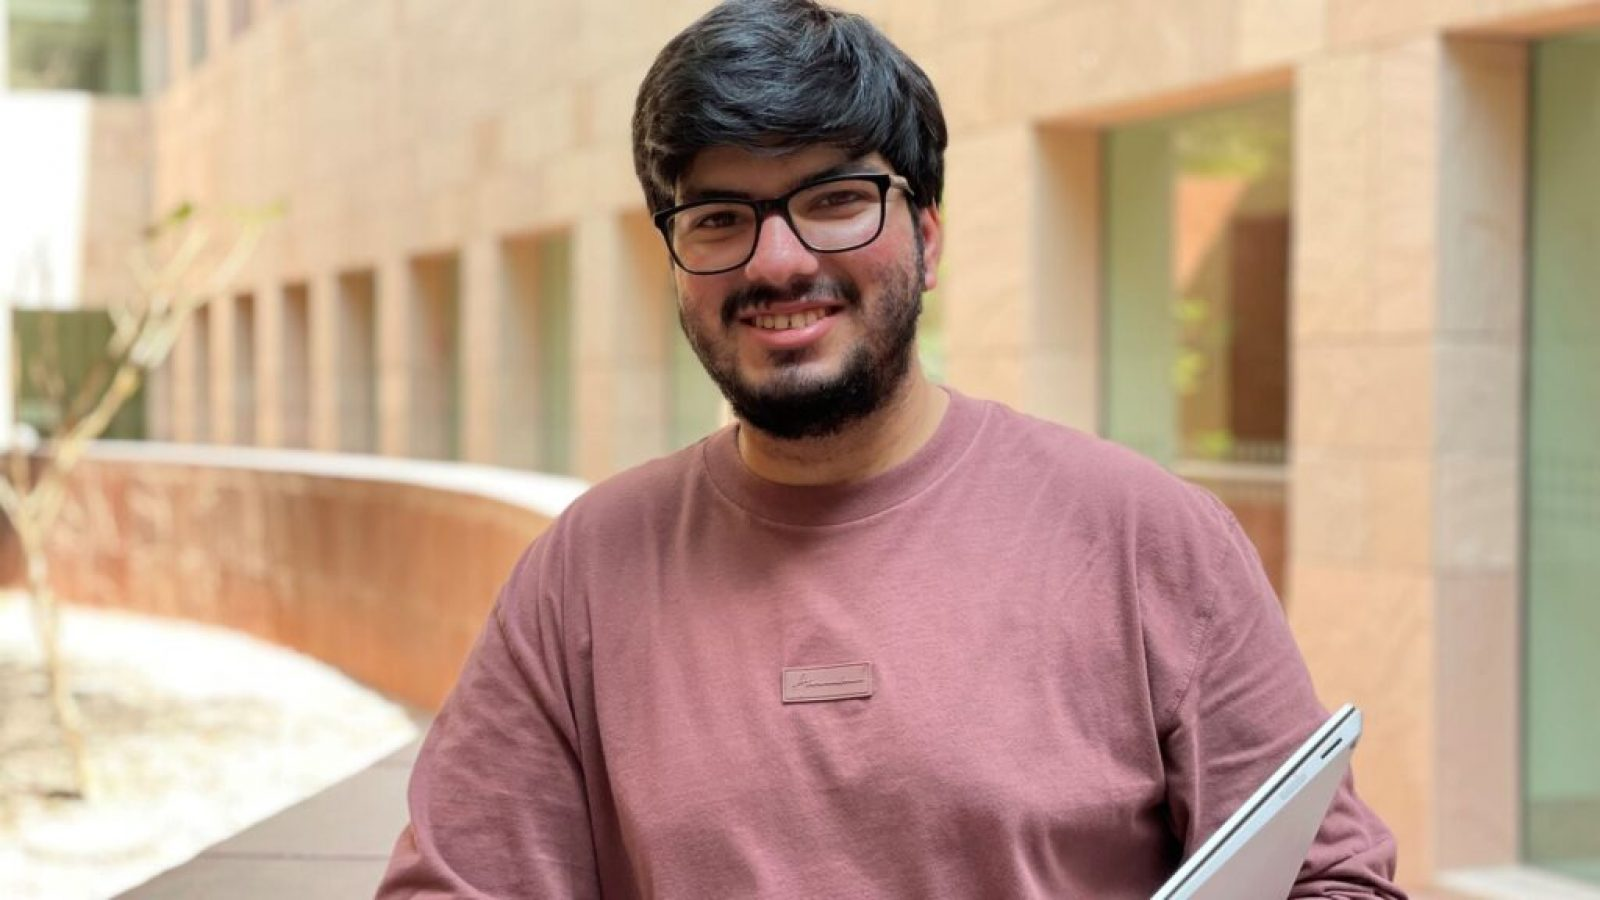 Kartikeya Uniyal wears glasses and a dark pink shirt